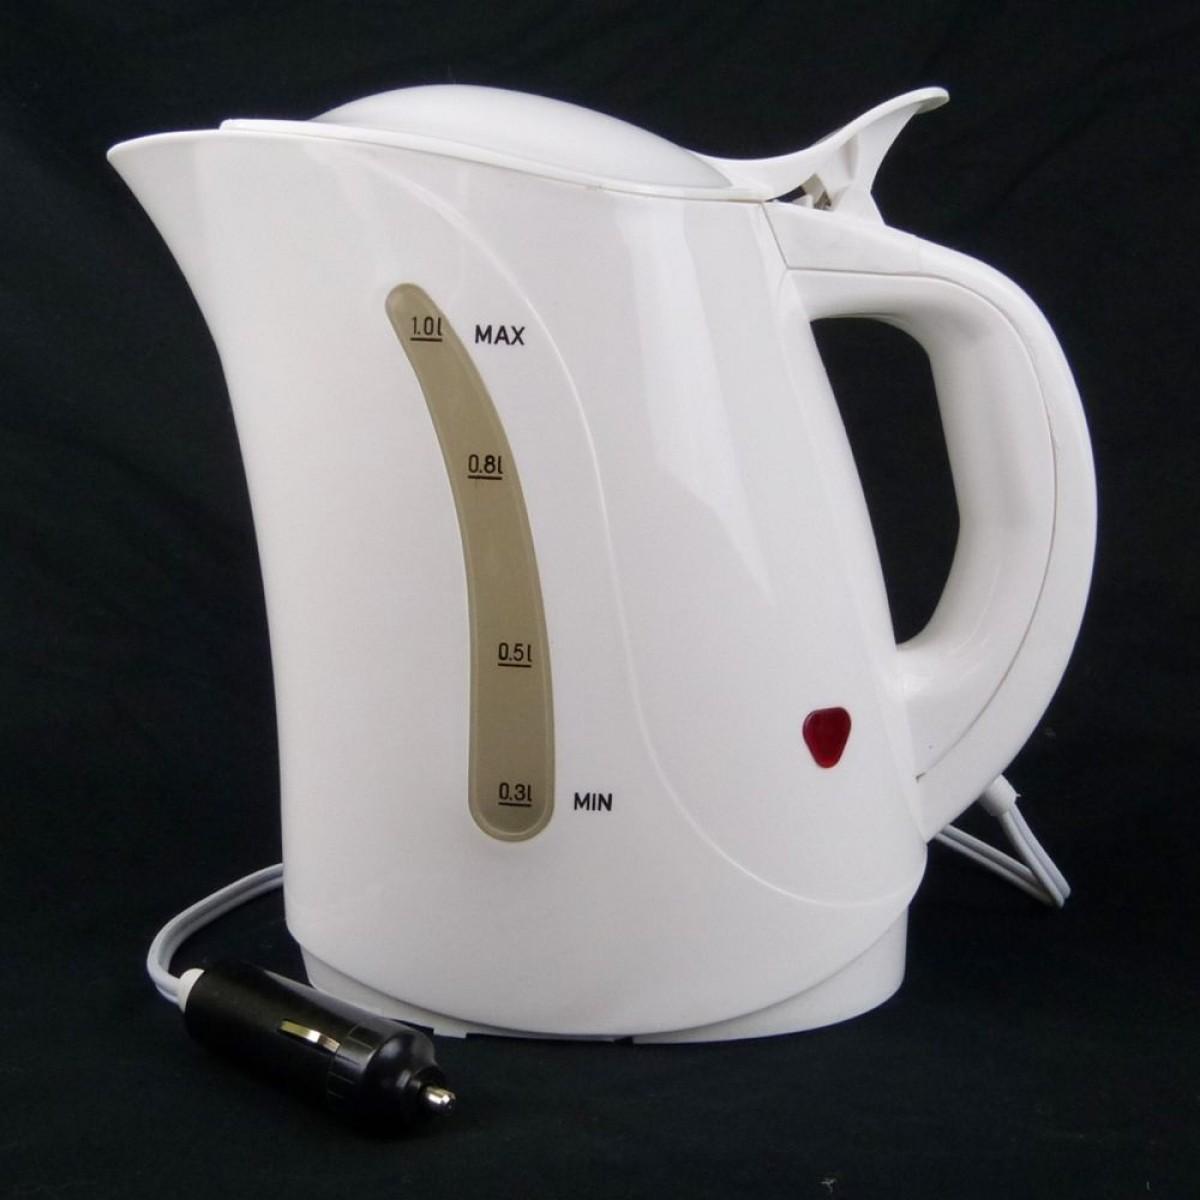 Soroko Trading Ltd - Smart Gadgets, Electronics, Spy , Hidden ...